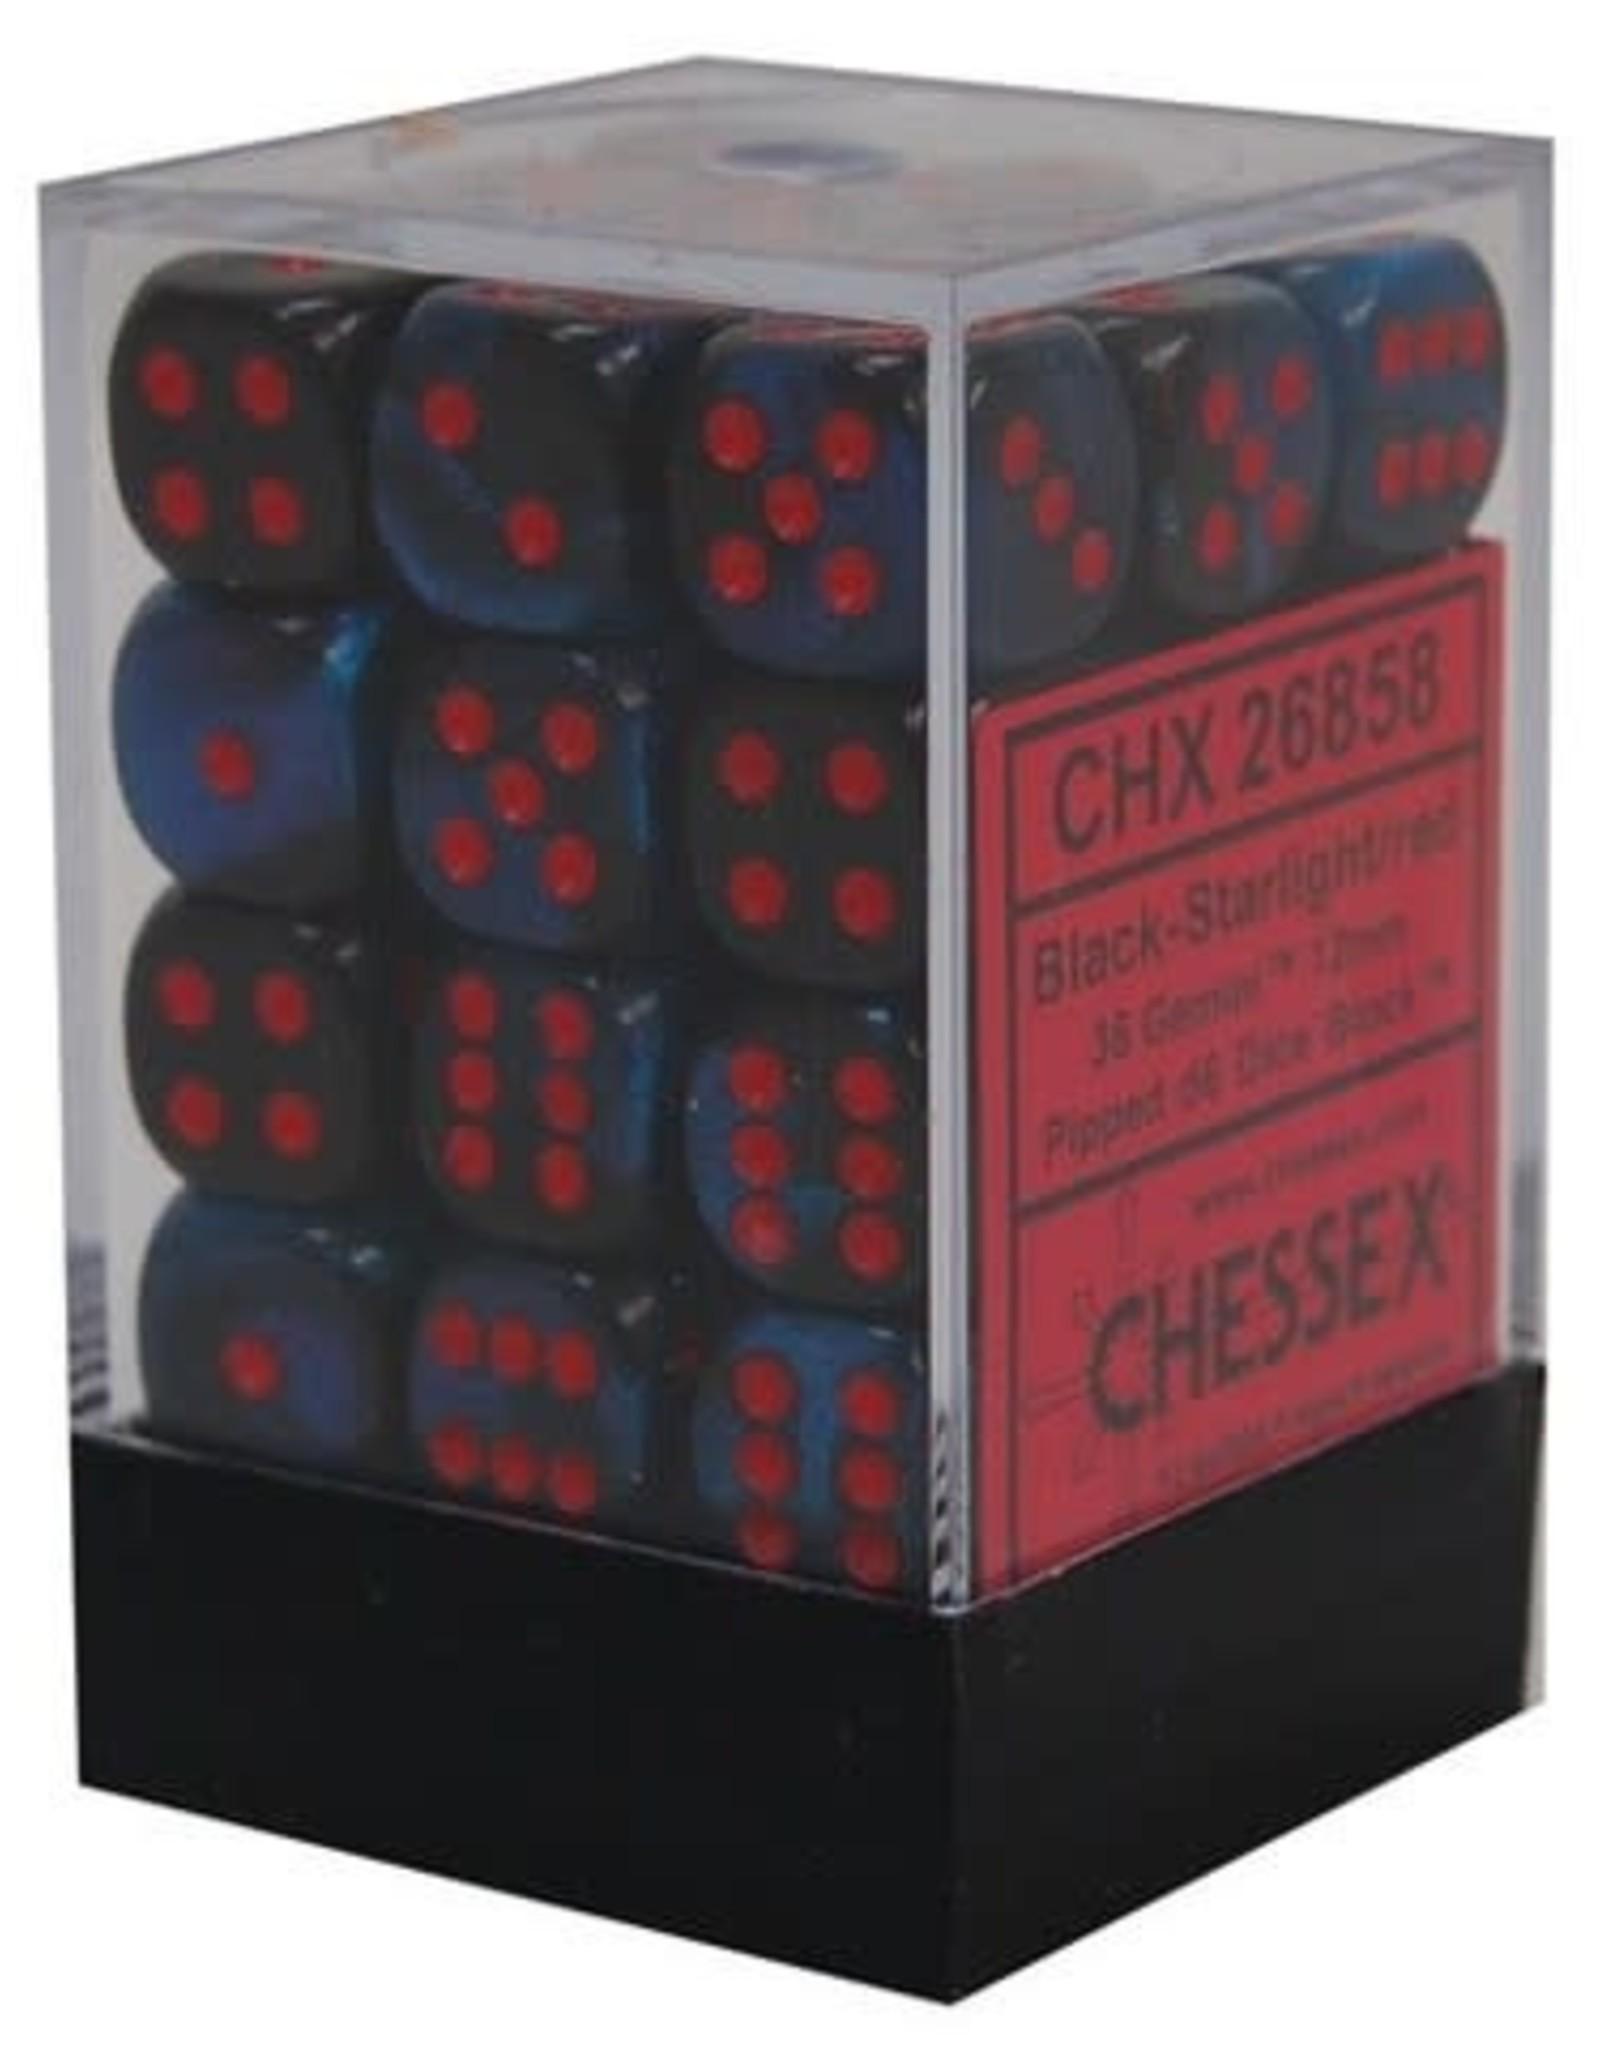 Chessex Black-Starlight/red Gemini 12mm d6 dice set